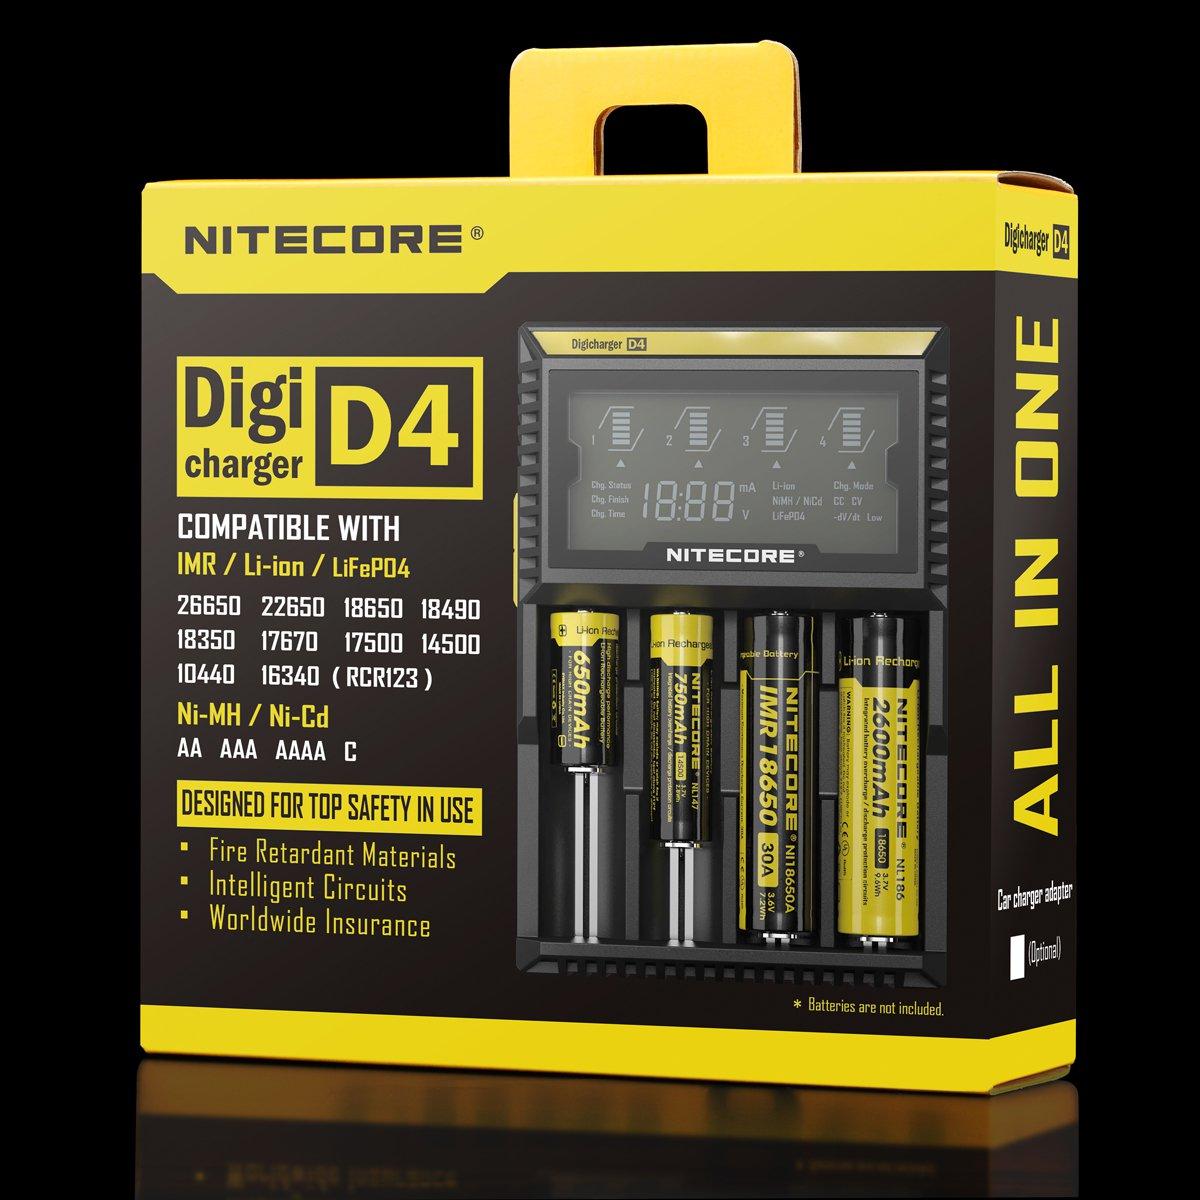 NITCORE_D4_box battery recharge uae